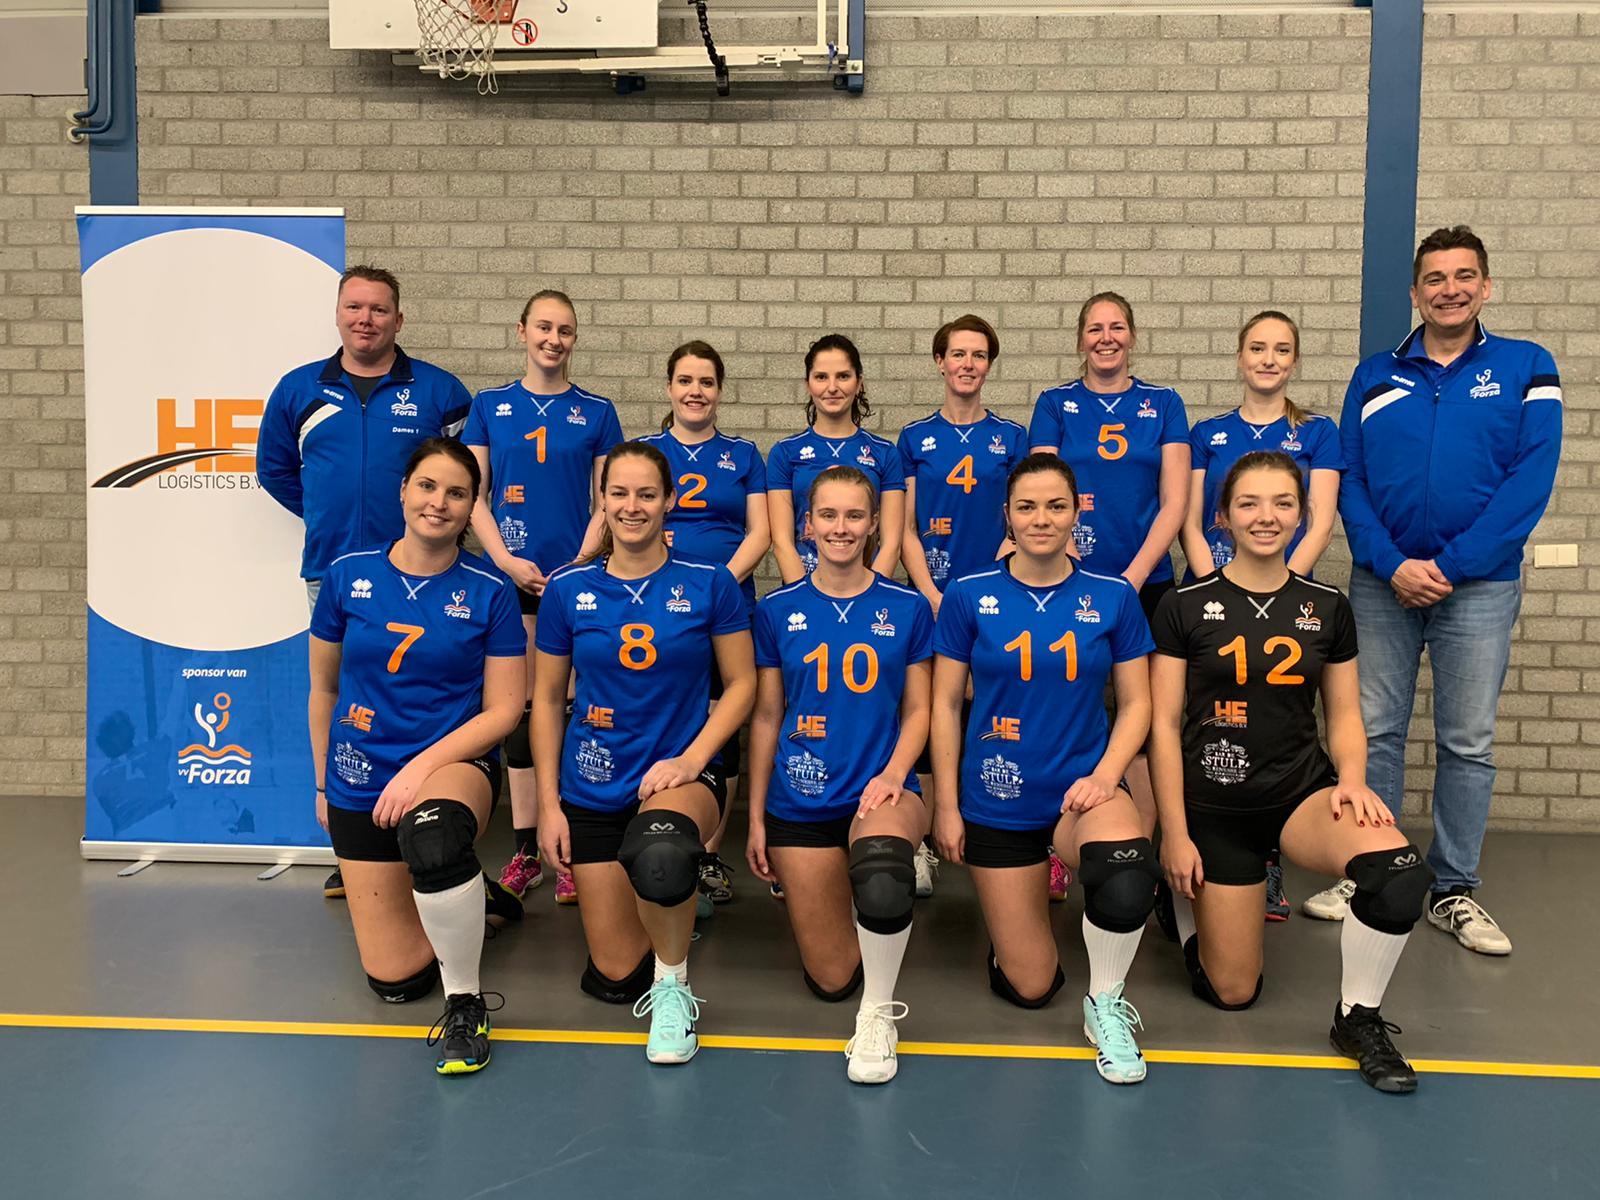 Forza schouwen-duiveland dames 1 2019-2020 volleybal